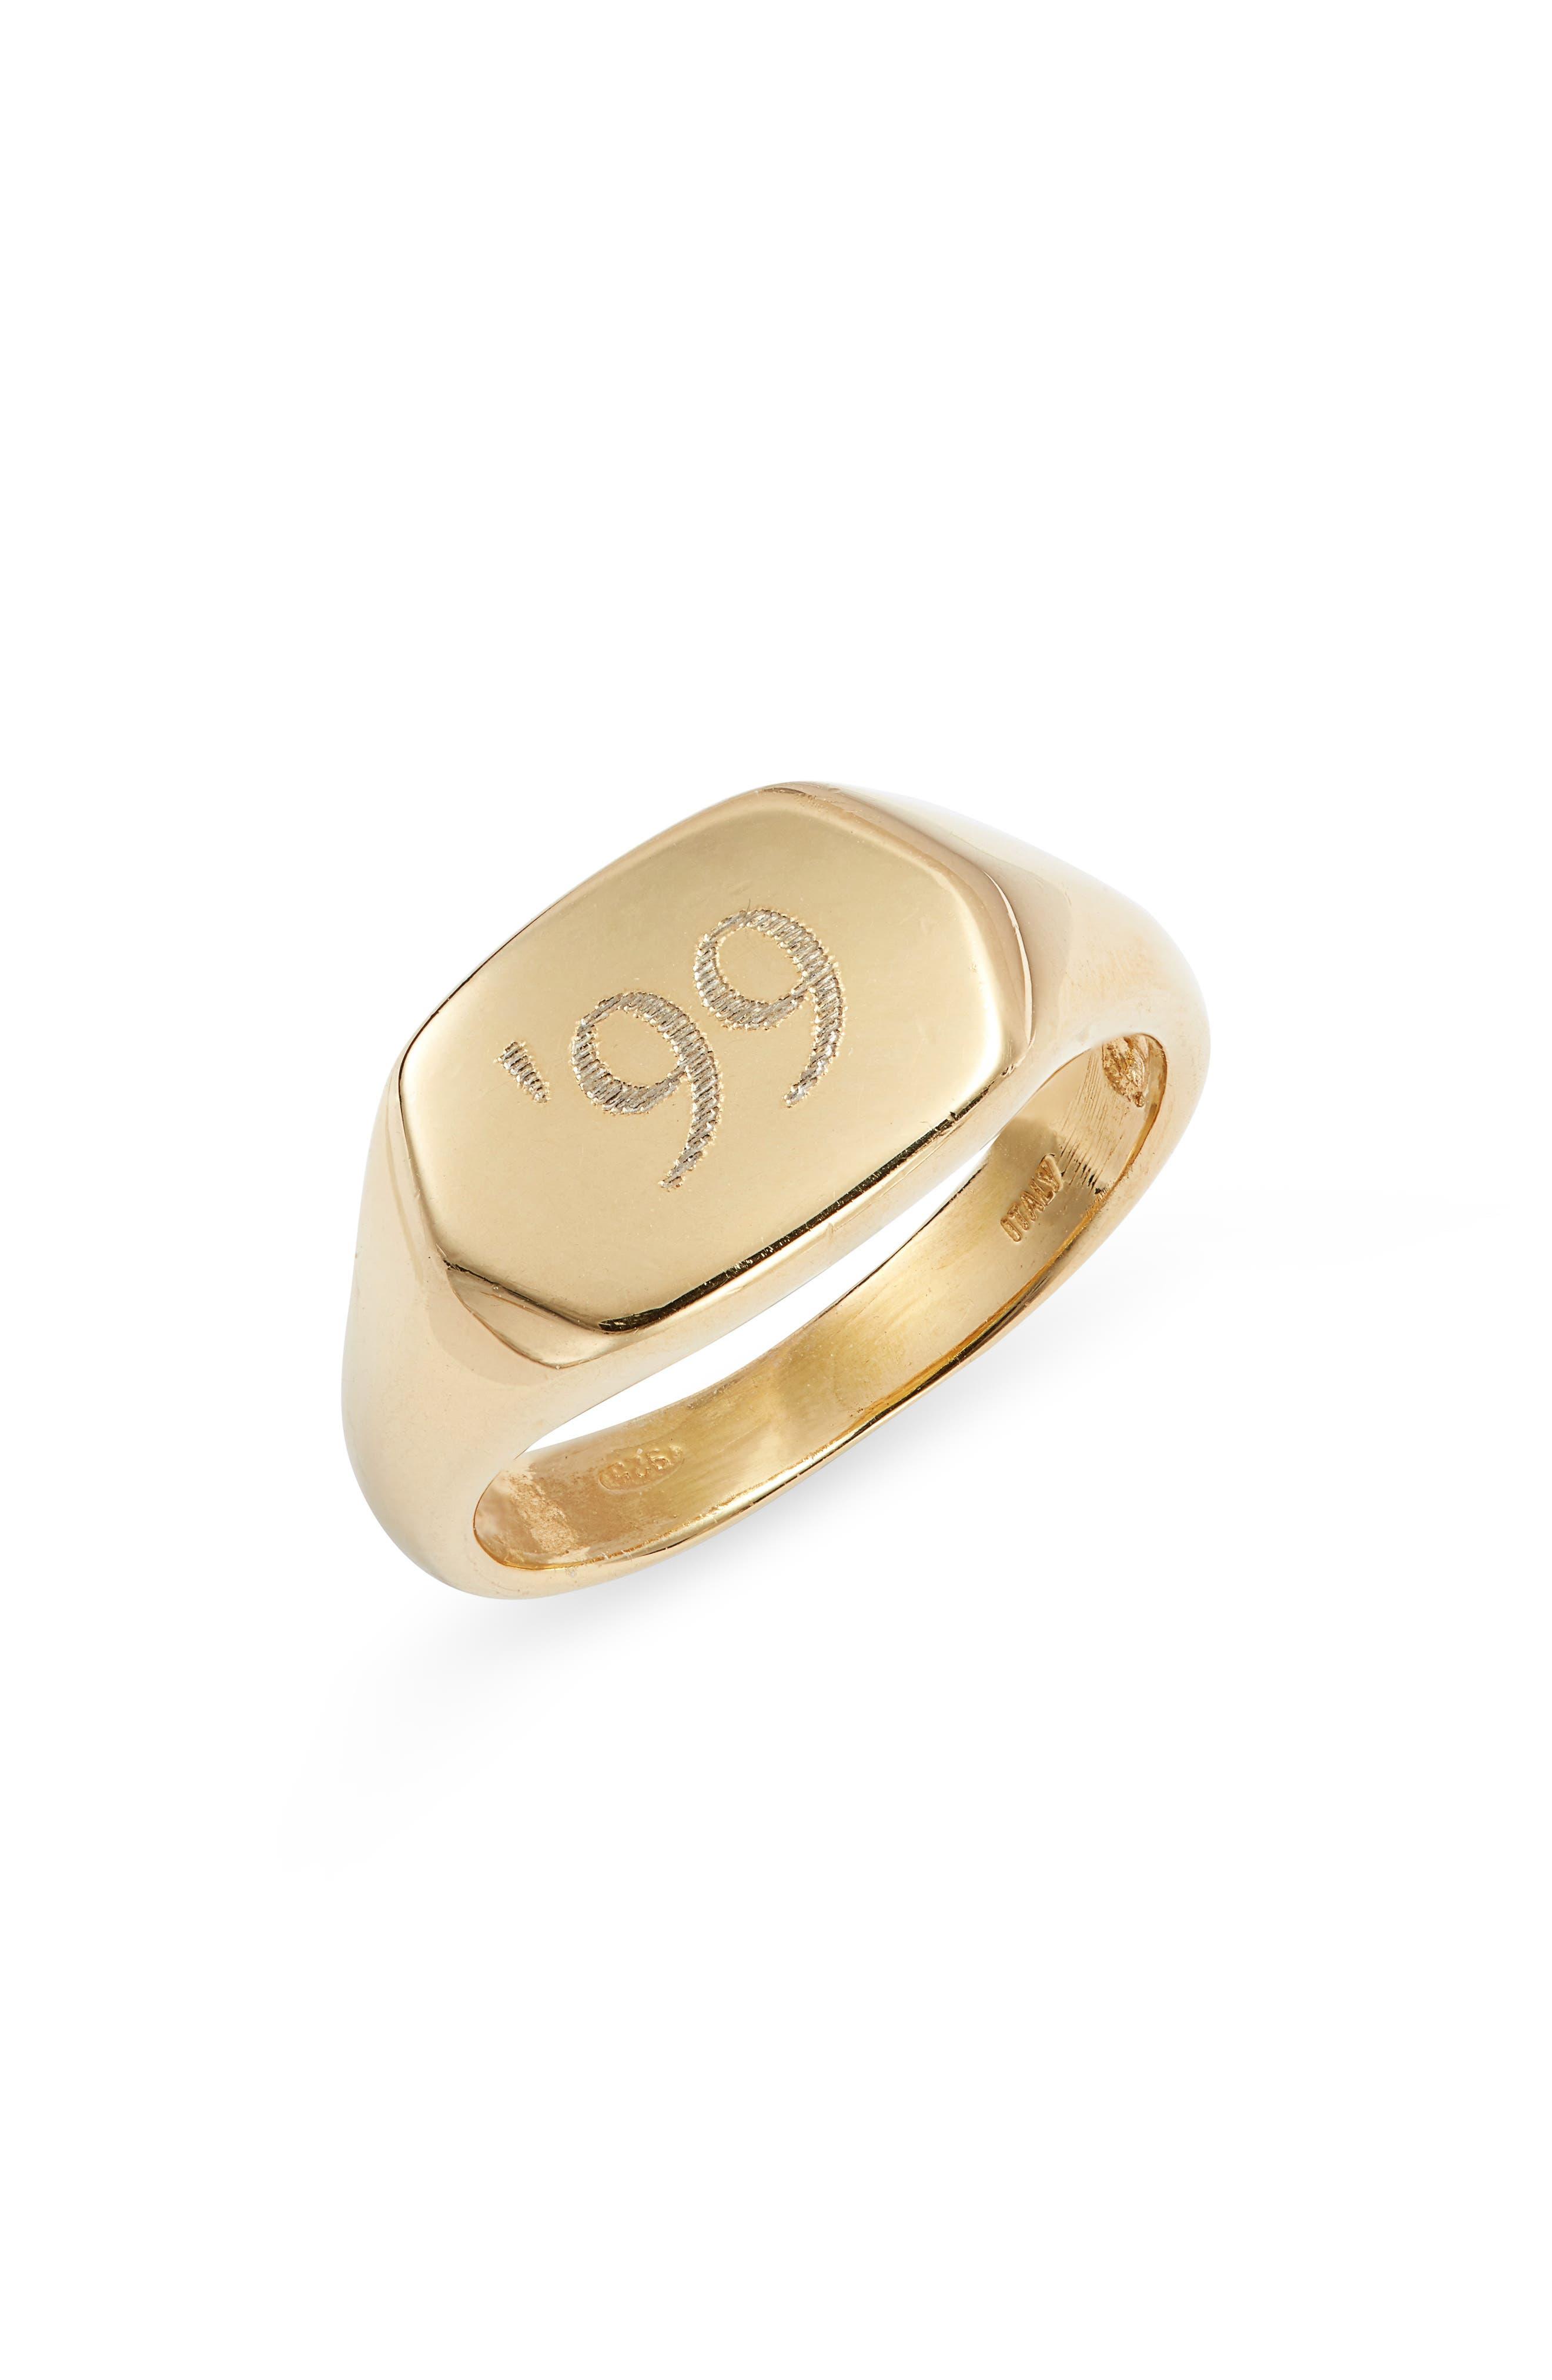 Women's Argento Vivo Personalized Signet Ring